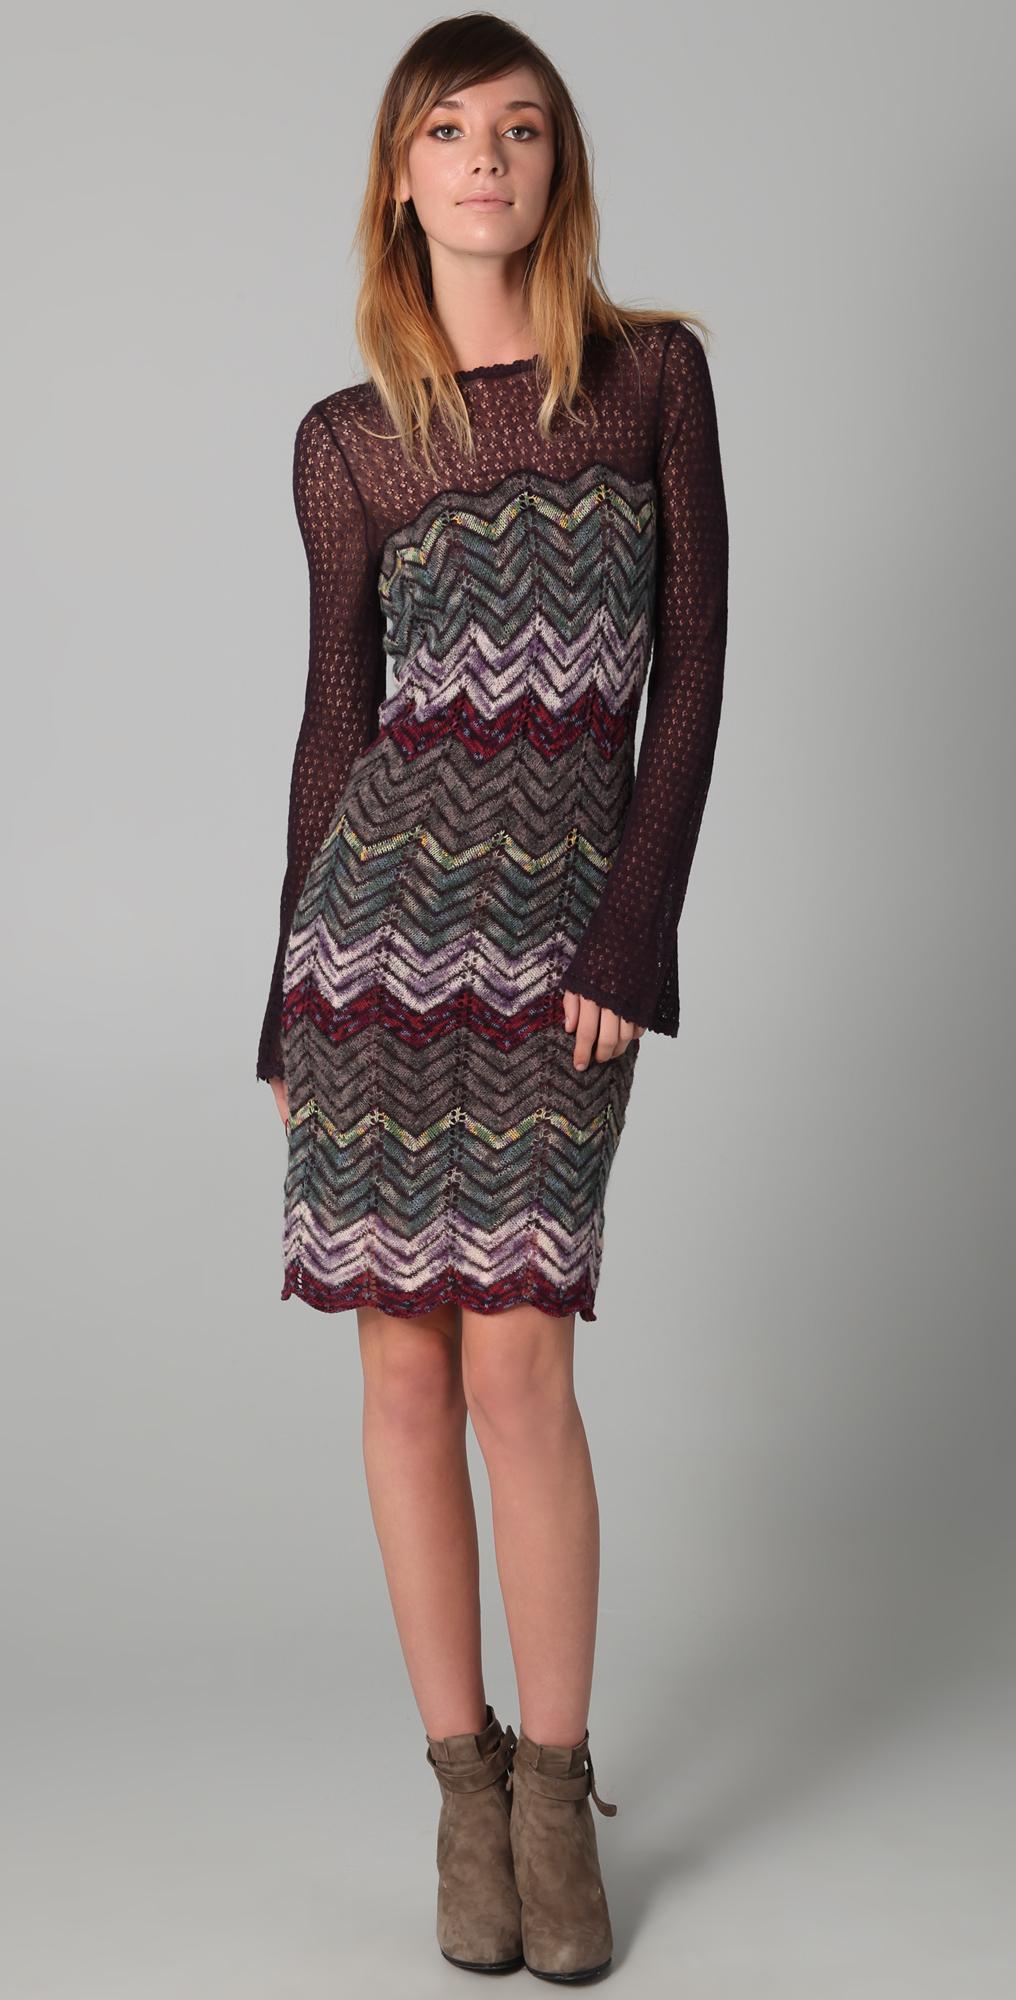 Free People Chevron Sweater Dress in Multicolor (Multi ...